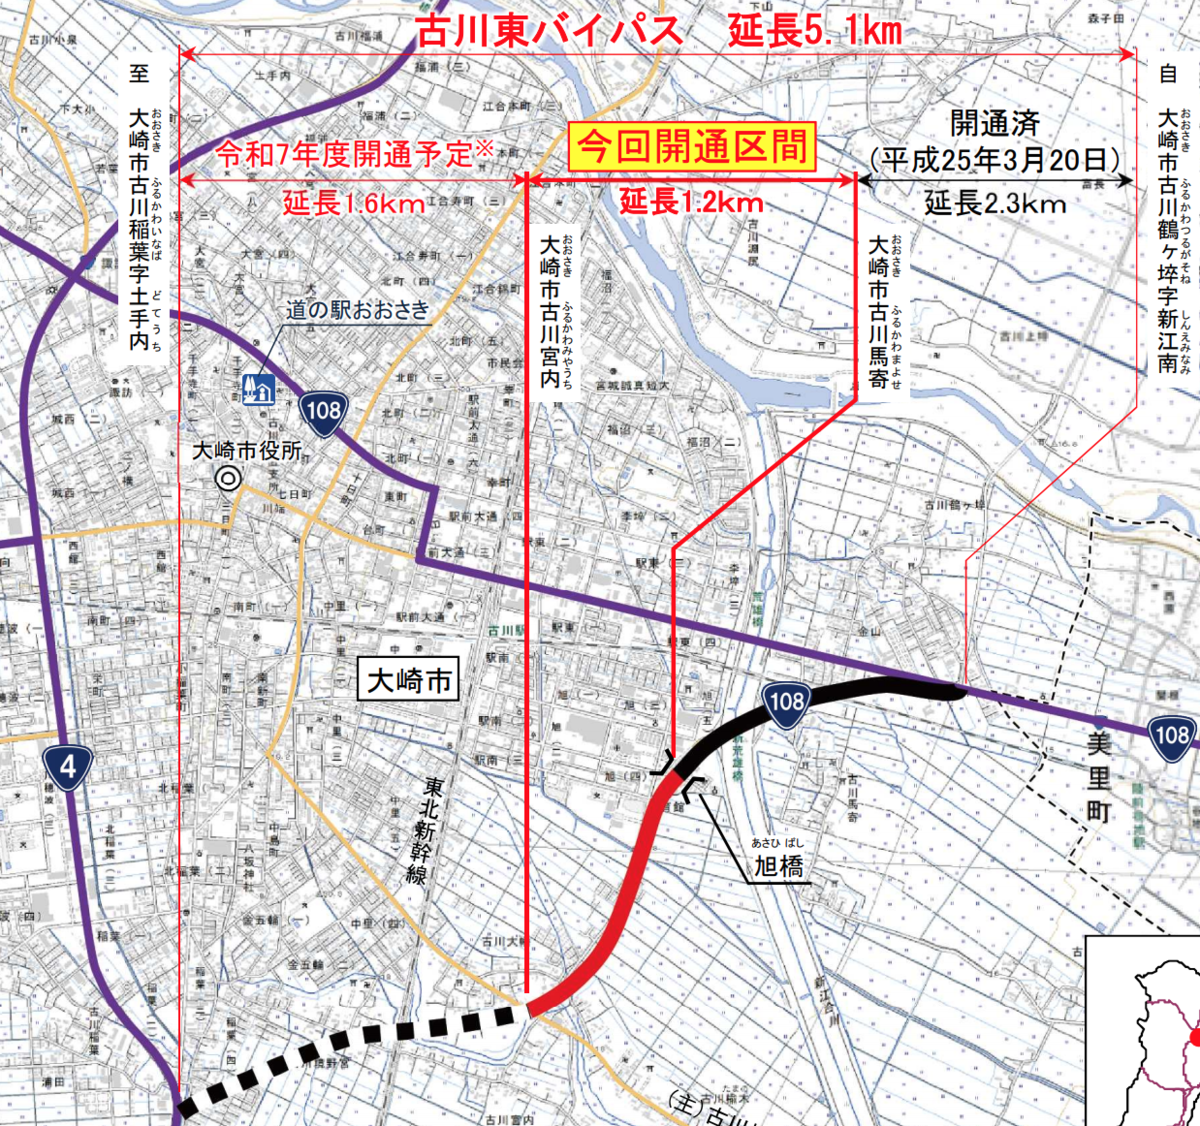 f:id:zakiyamatakashi:20200312224820p:plain